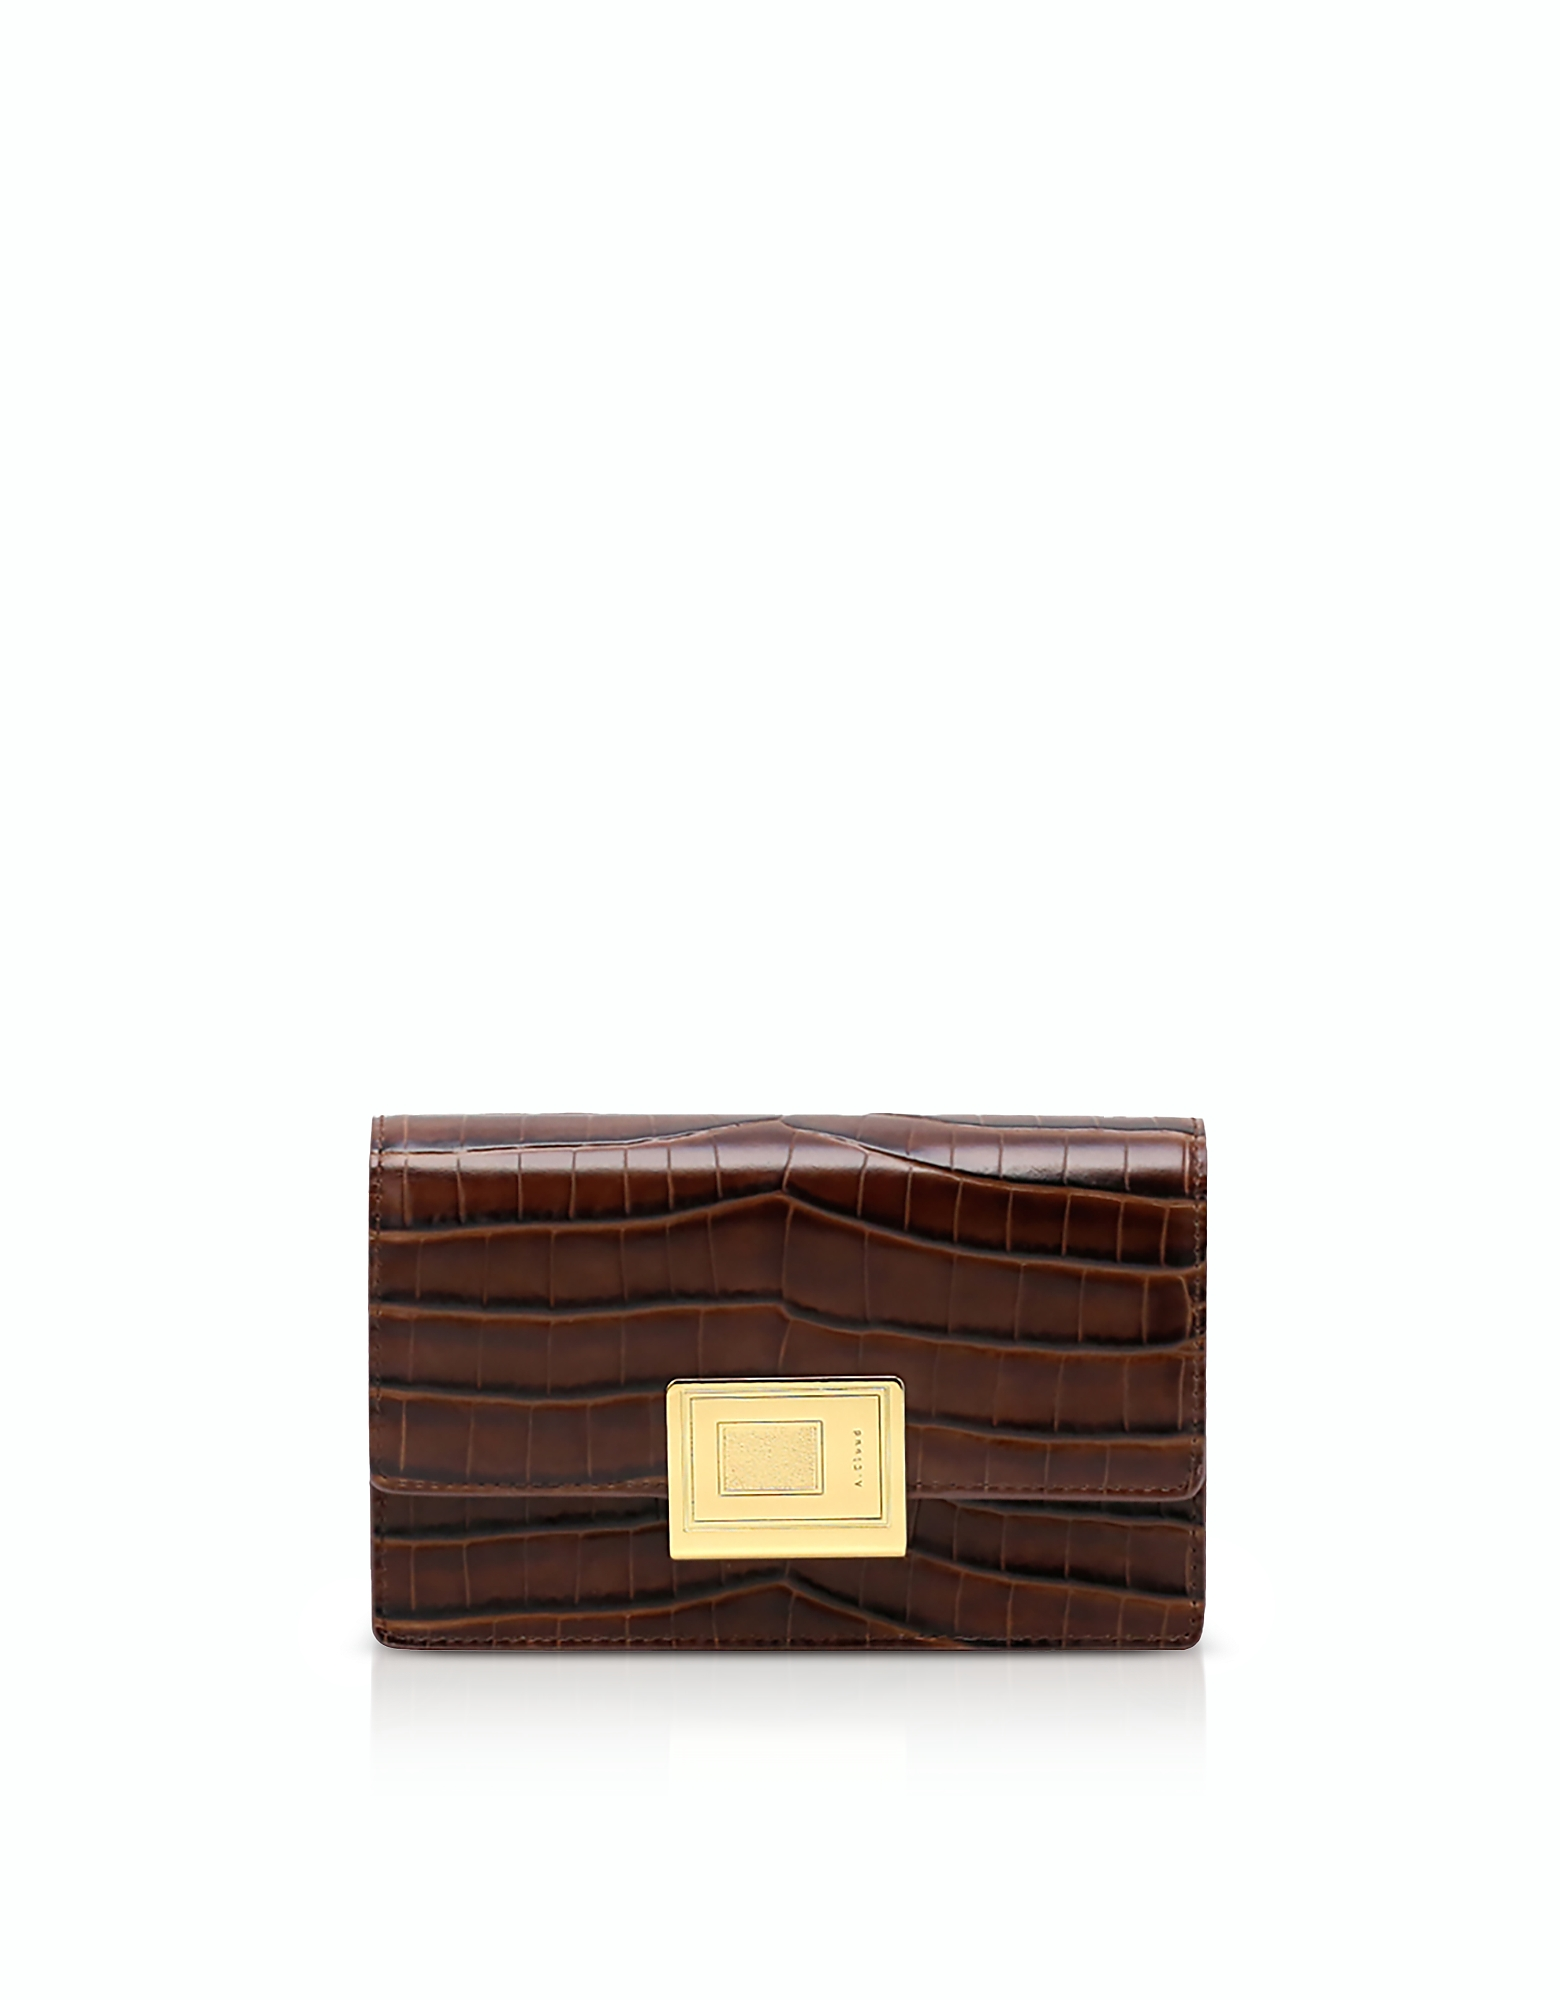 Forzieri coupon: A.Cloud  Handbags Mult-Book Belt Bag